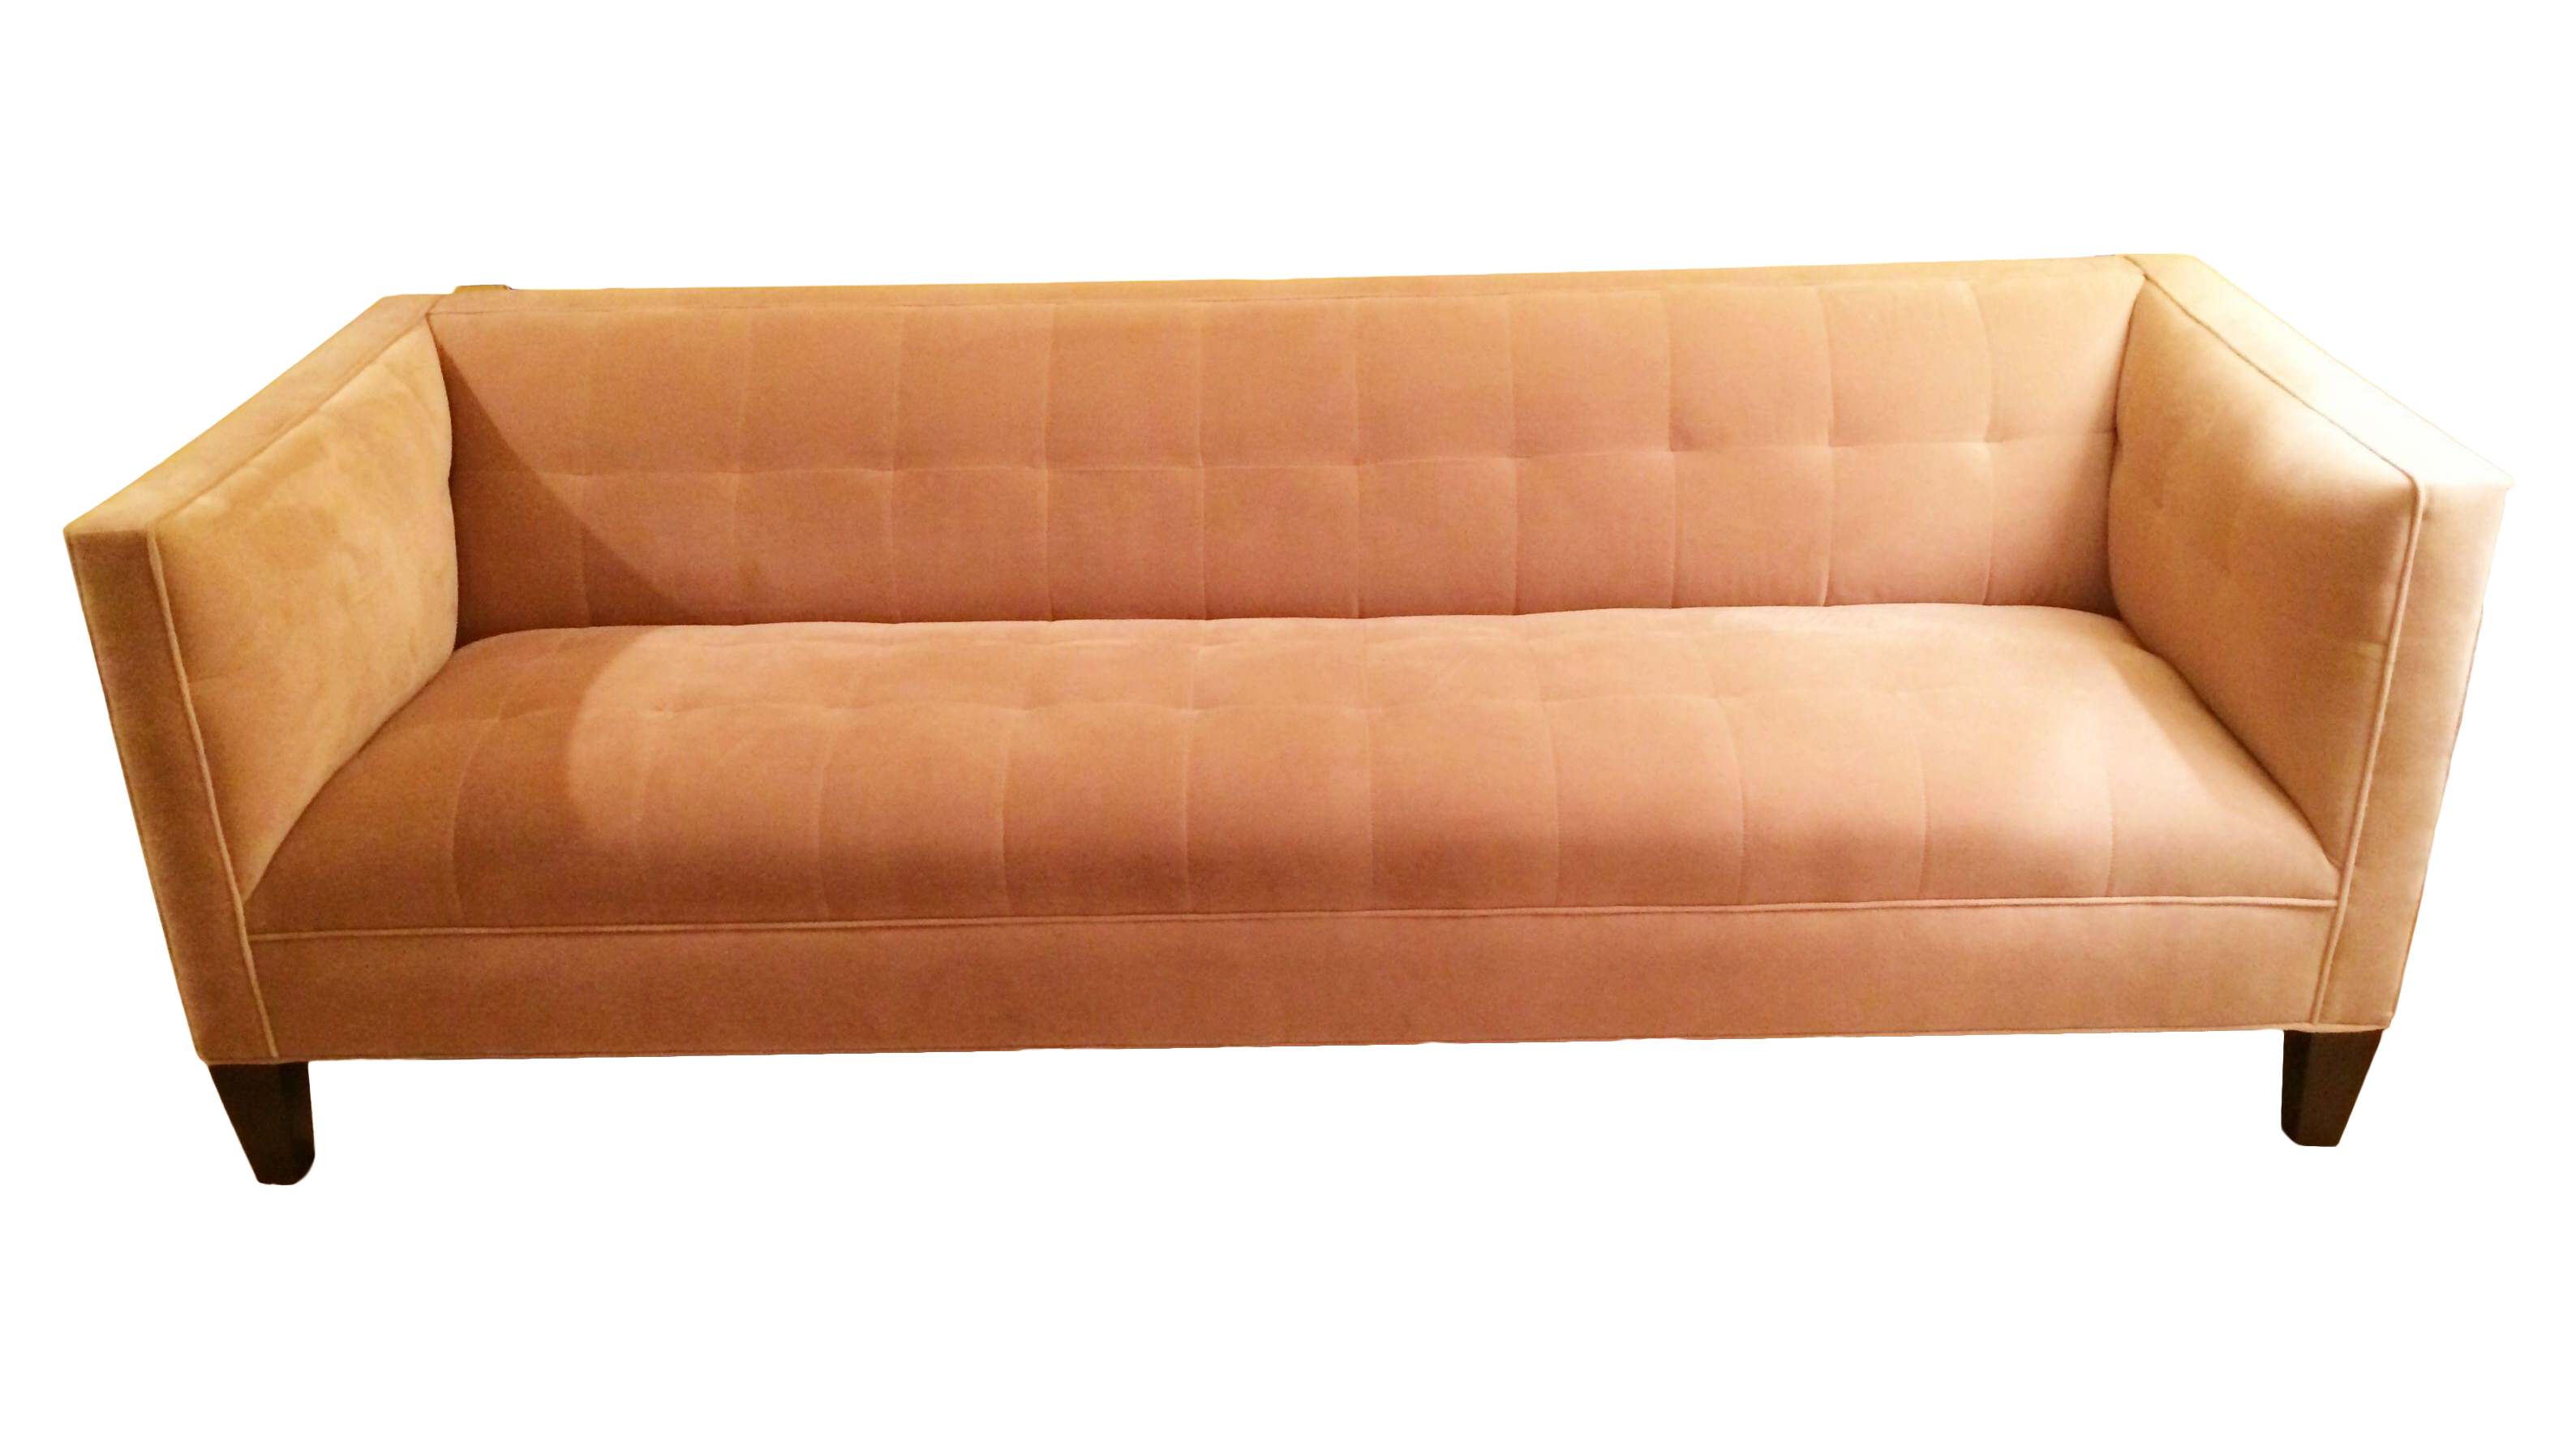 Mitchell Gold amp Bob Williams Kennedy Sofa Chairish : e56f07be a126 4073 a116 29a3be614e98aspectfitampwidth640ampheight640 from www.chairish.com size 640 x 640 jpeg 22kB